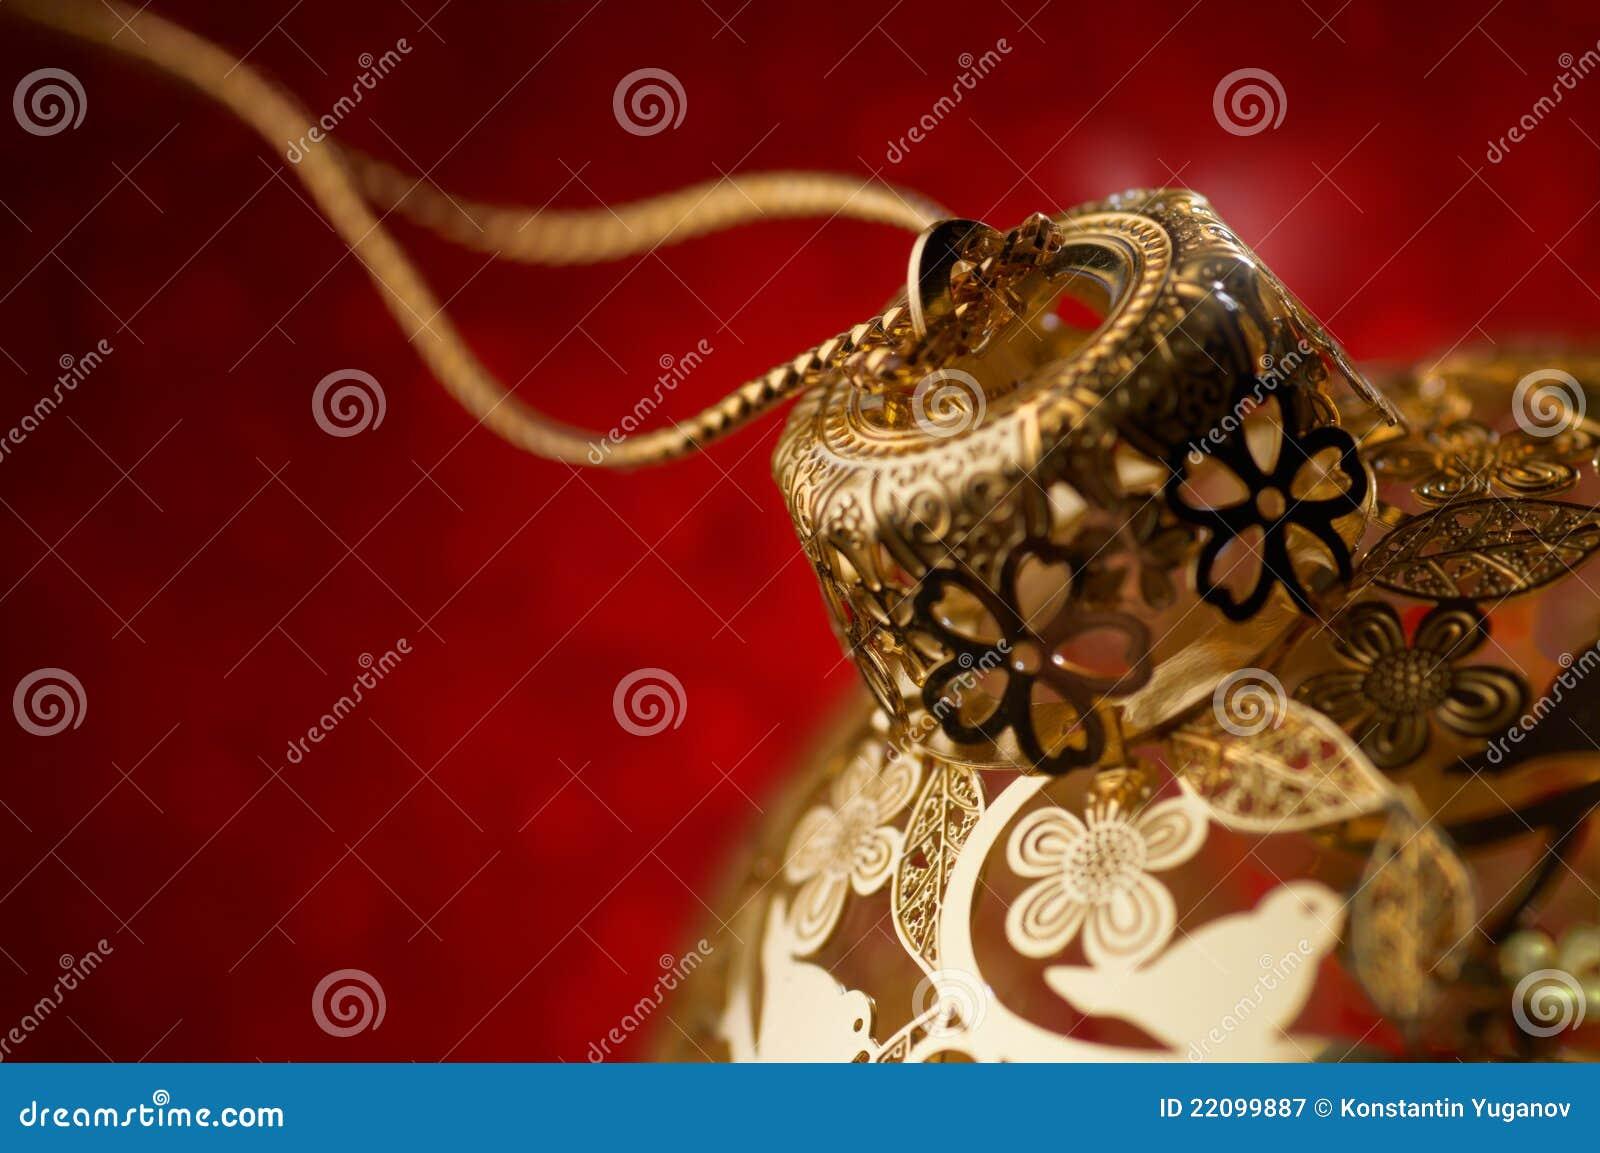 #3C0B03 Christmas Decoration Royalty Free Stock Photography  6361 décoration noel commerce 1300x953 px @ aertt.com